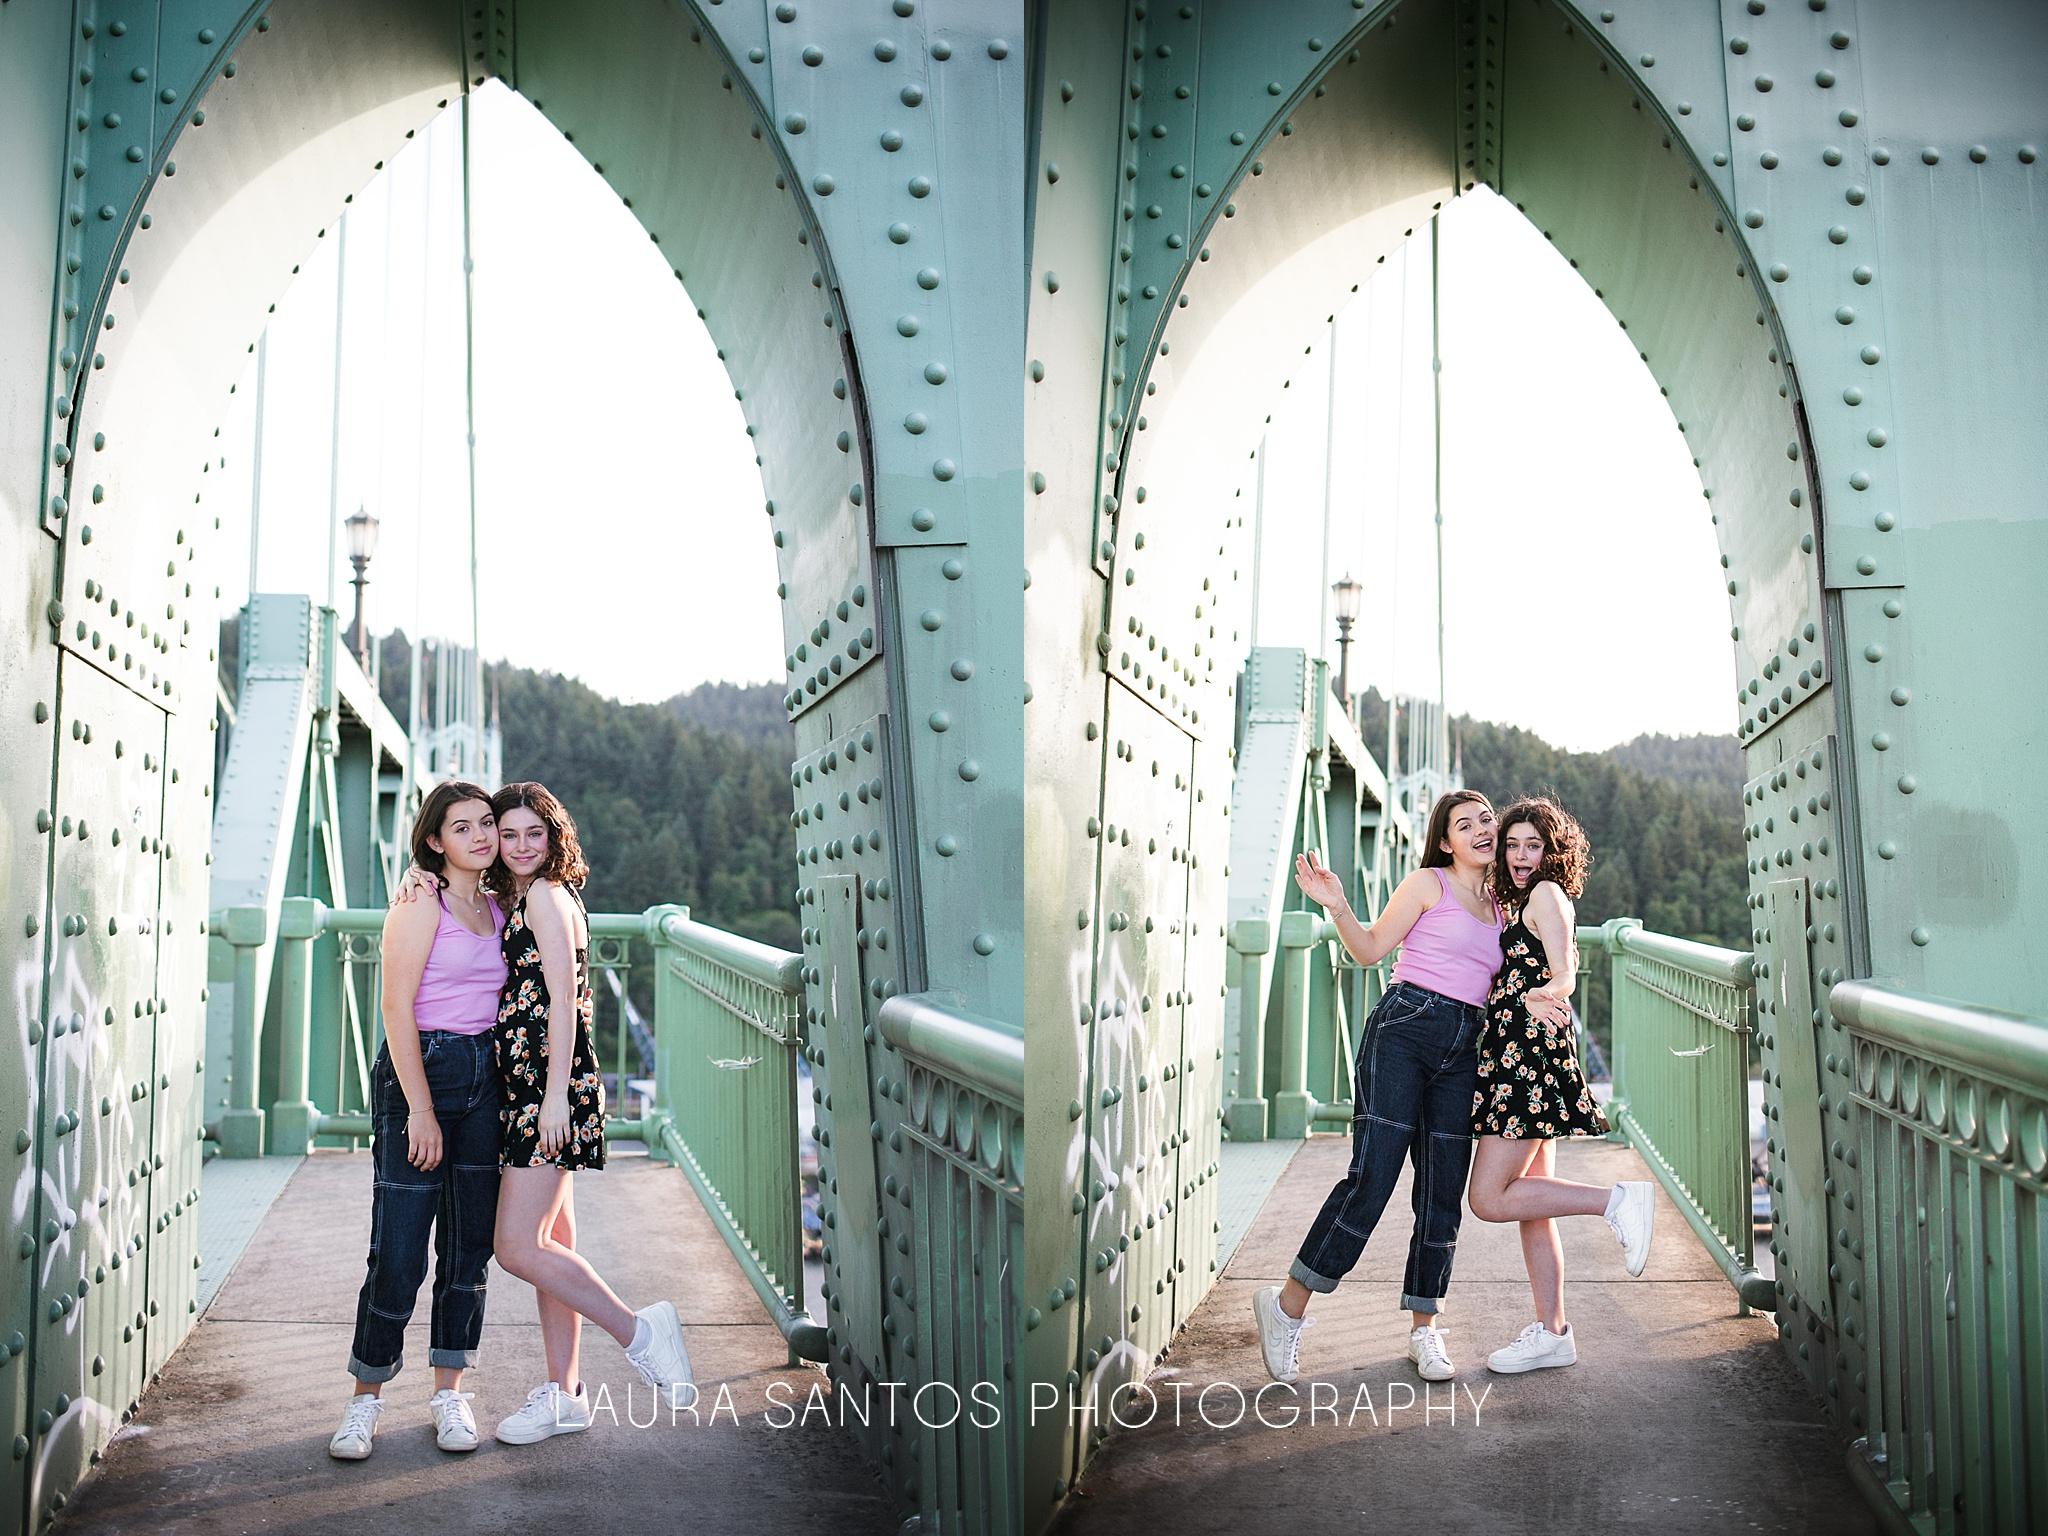 Laura Santos Photography Portland Oregon Family Photographer_0993.jpg